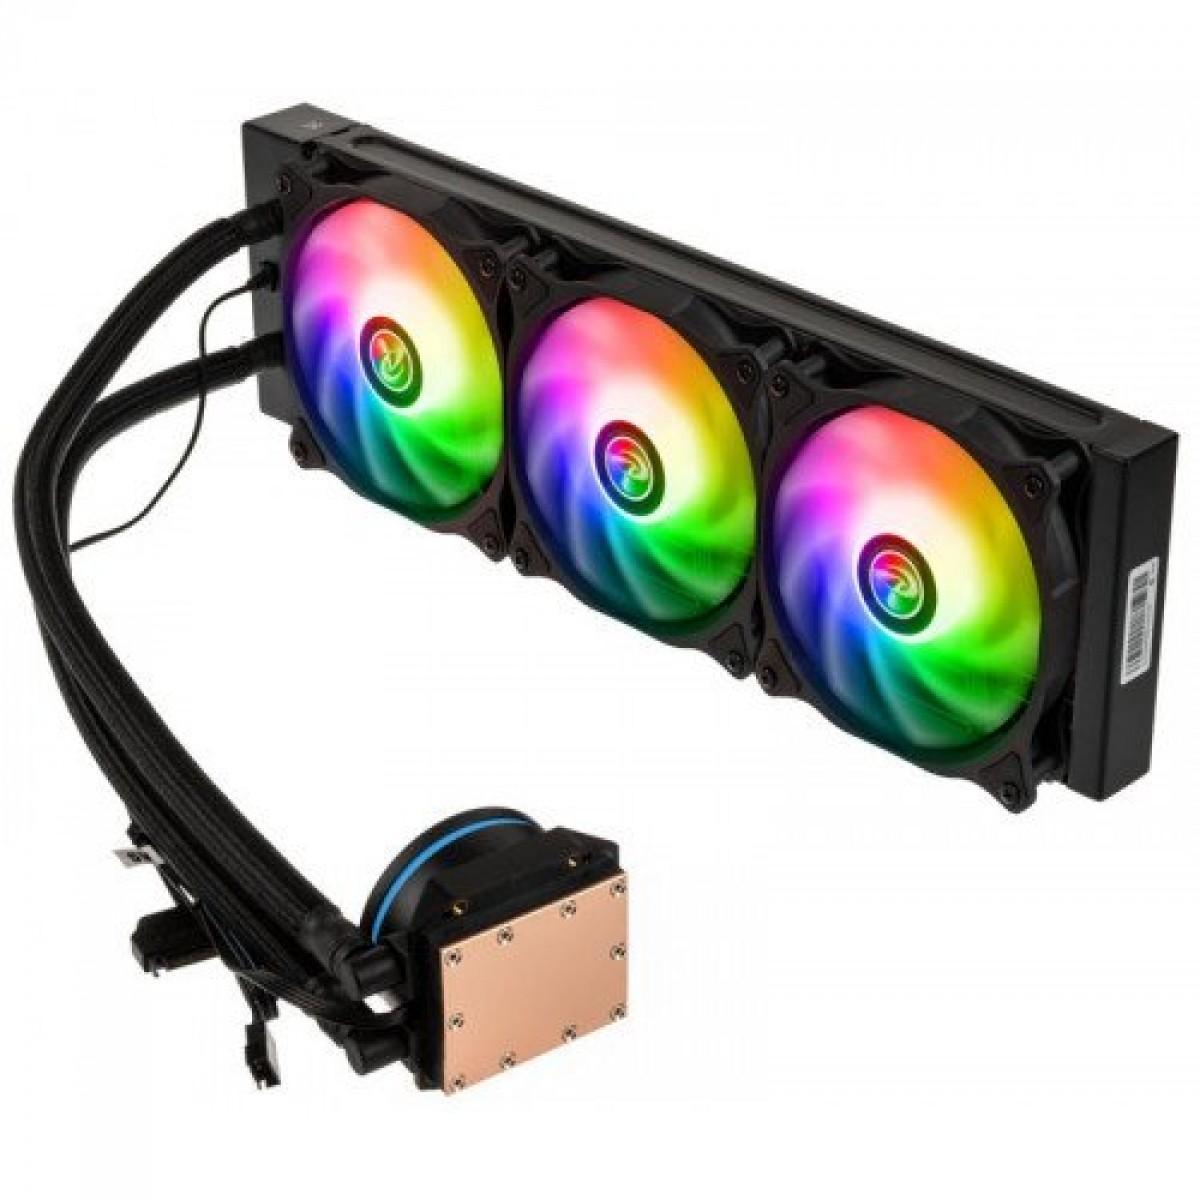 Water Cooler Raijintek EOS 360 RBW, 360mm, ARGB, Intel-AMD, 0R10B00181 - Open Box